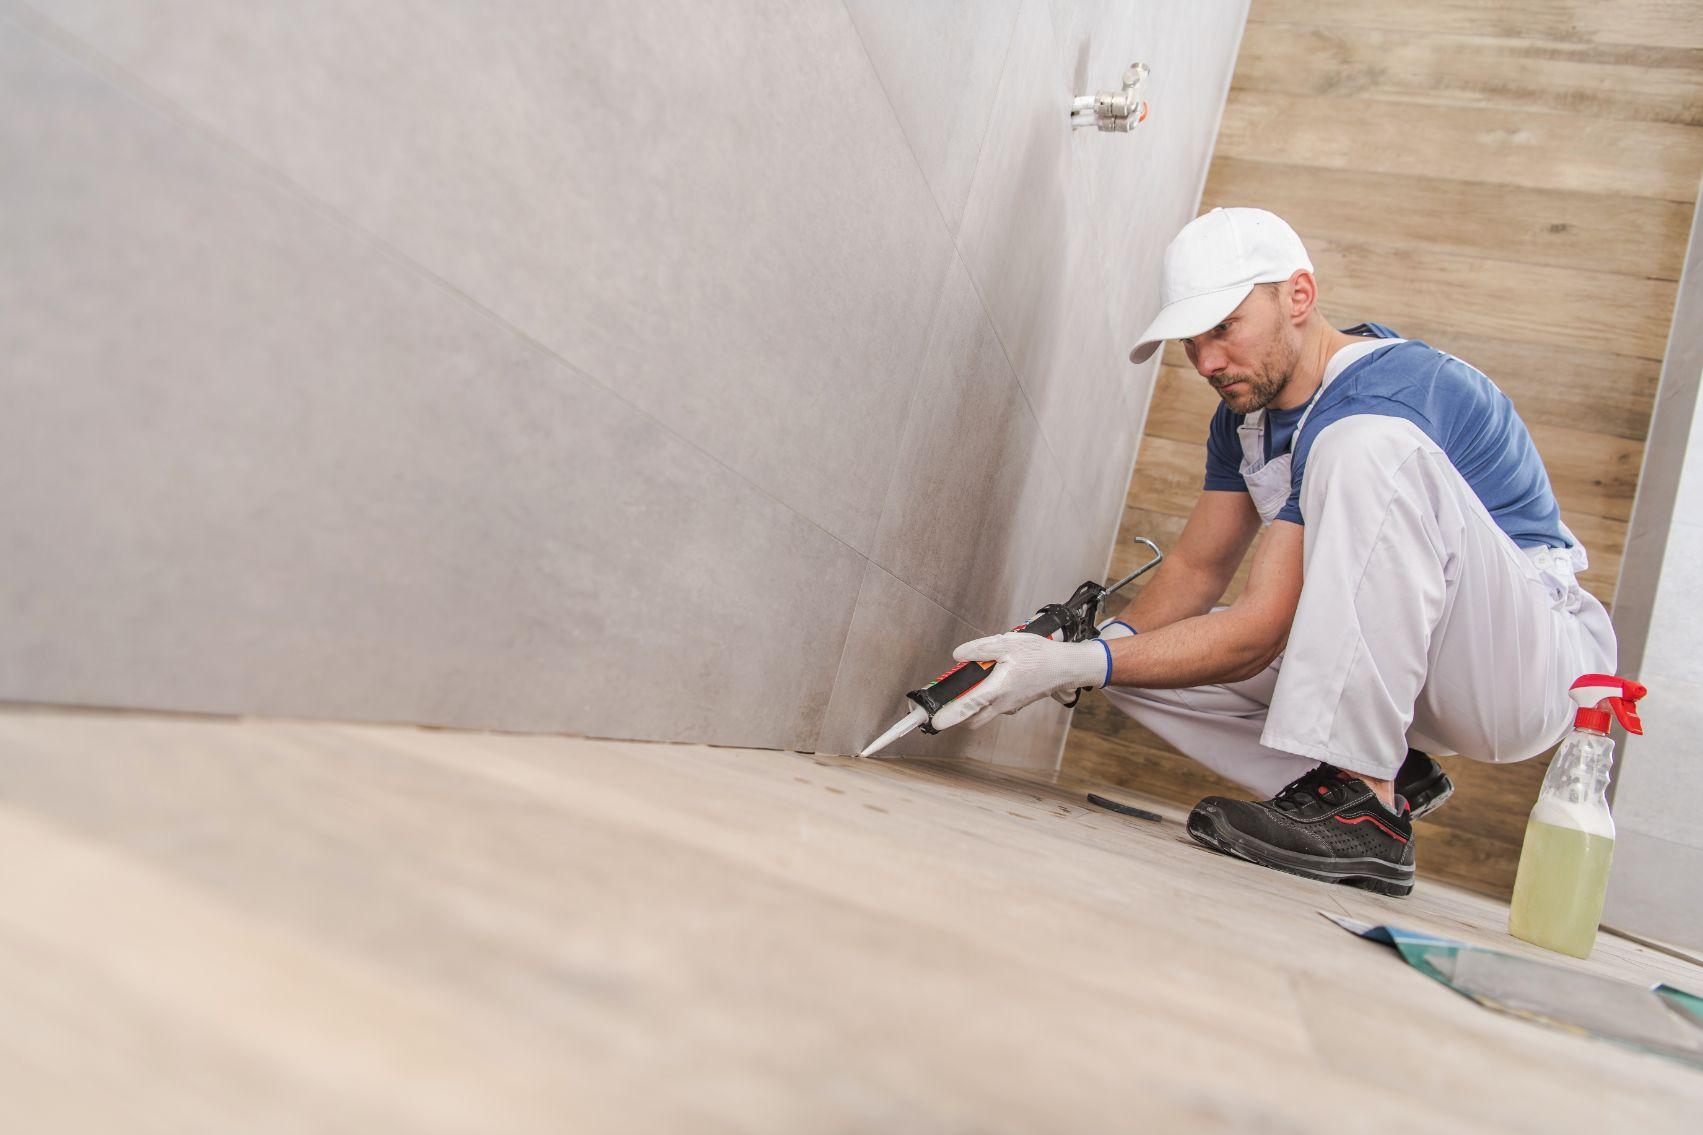 worker sealing ceramic tiles ZNUCA